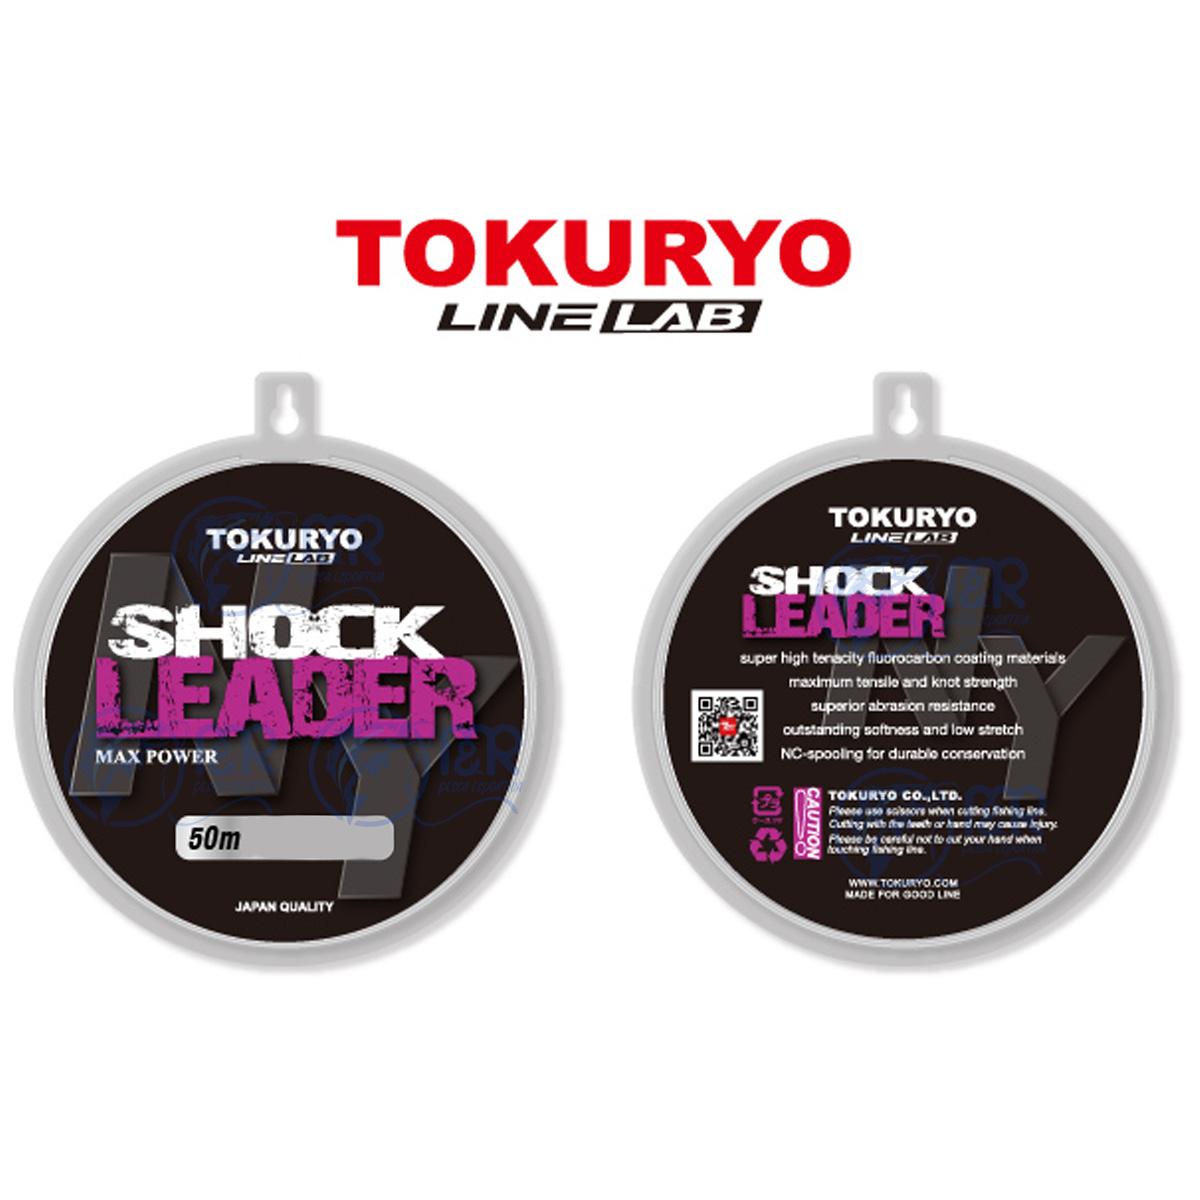 Linha Monofilamento Shock Leader 0.41mm 11kg 50m Tokuryo